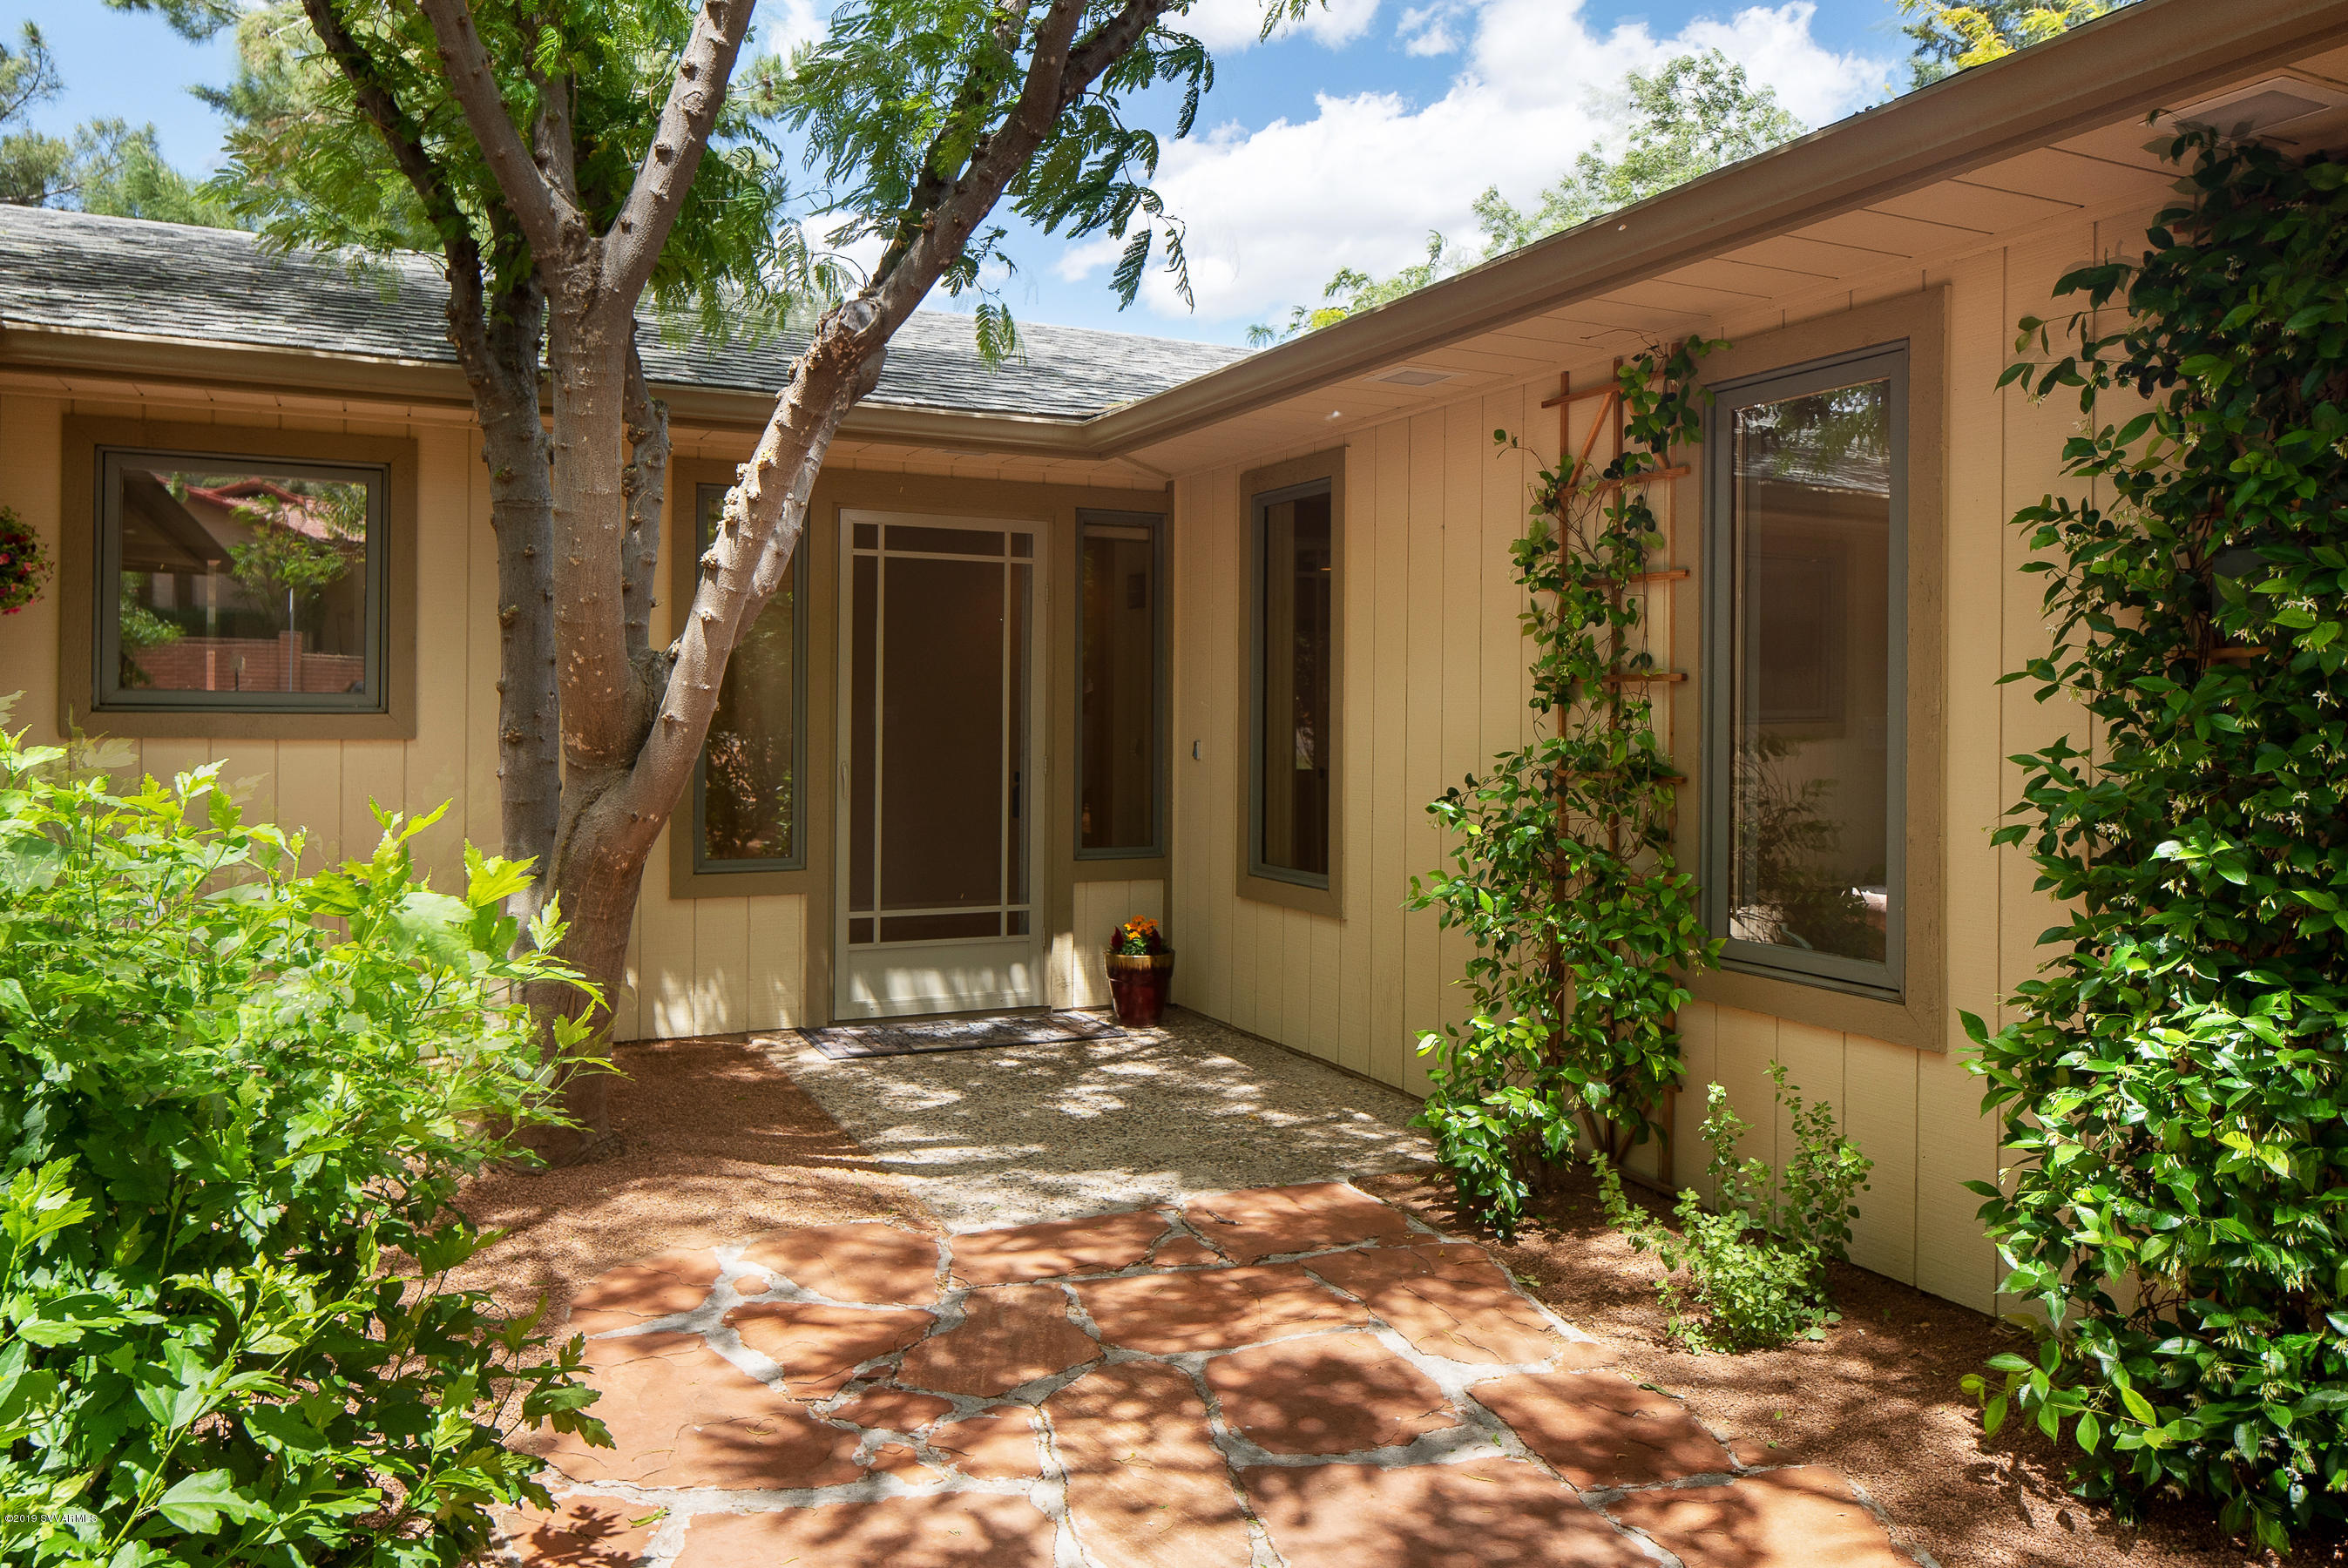 190 Montazona Trail Sedona, AZ 86351